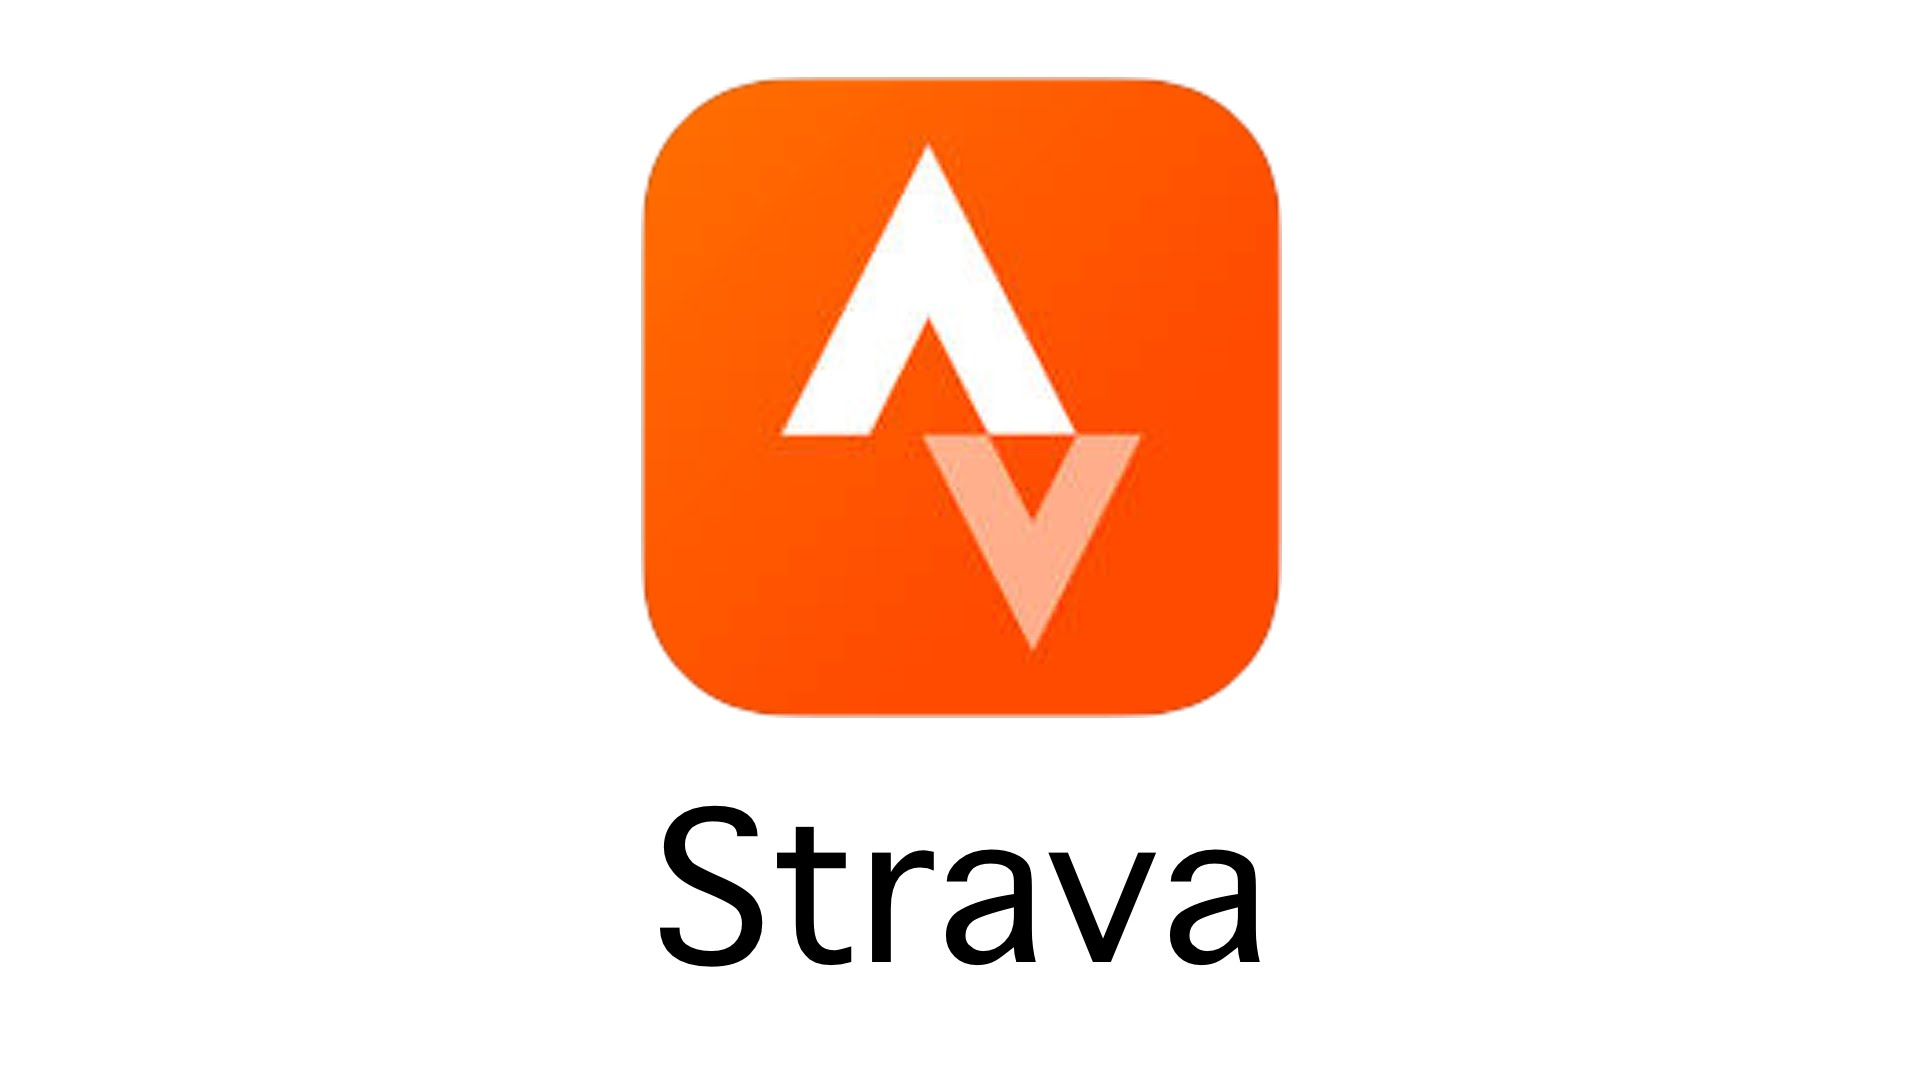 login with strava